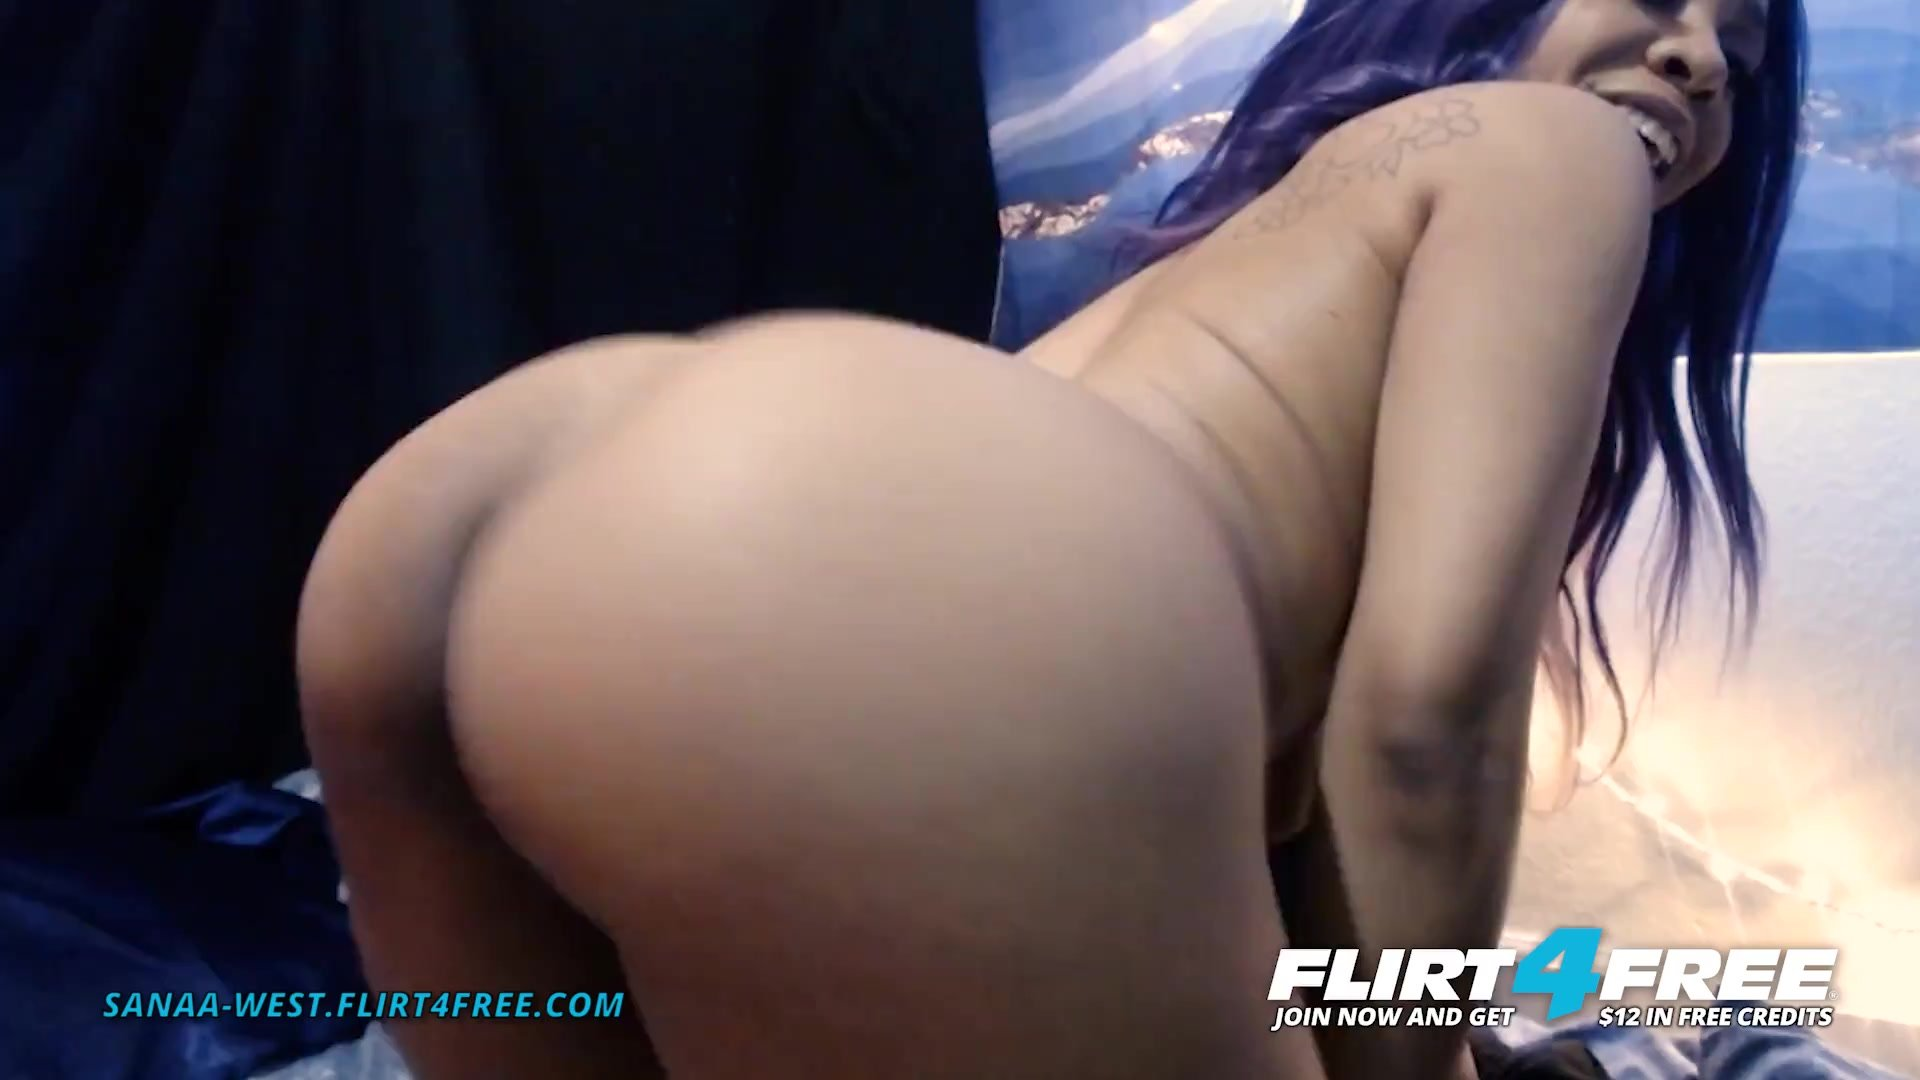 Sanaa West on Flirt4Free - Ebony Babe w Huge Tits Sucks Her Perfect Nipples